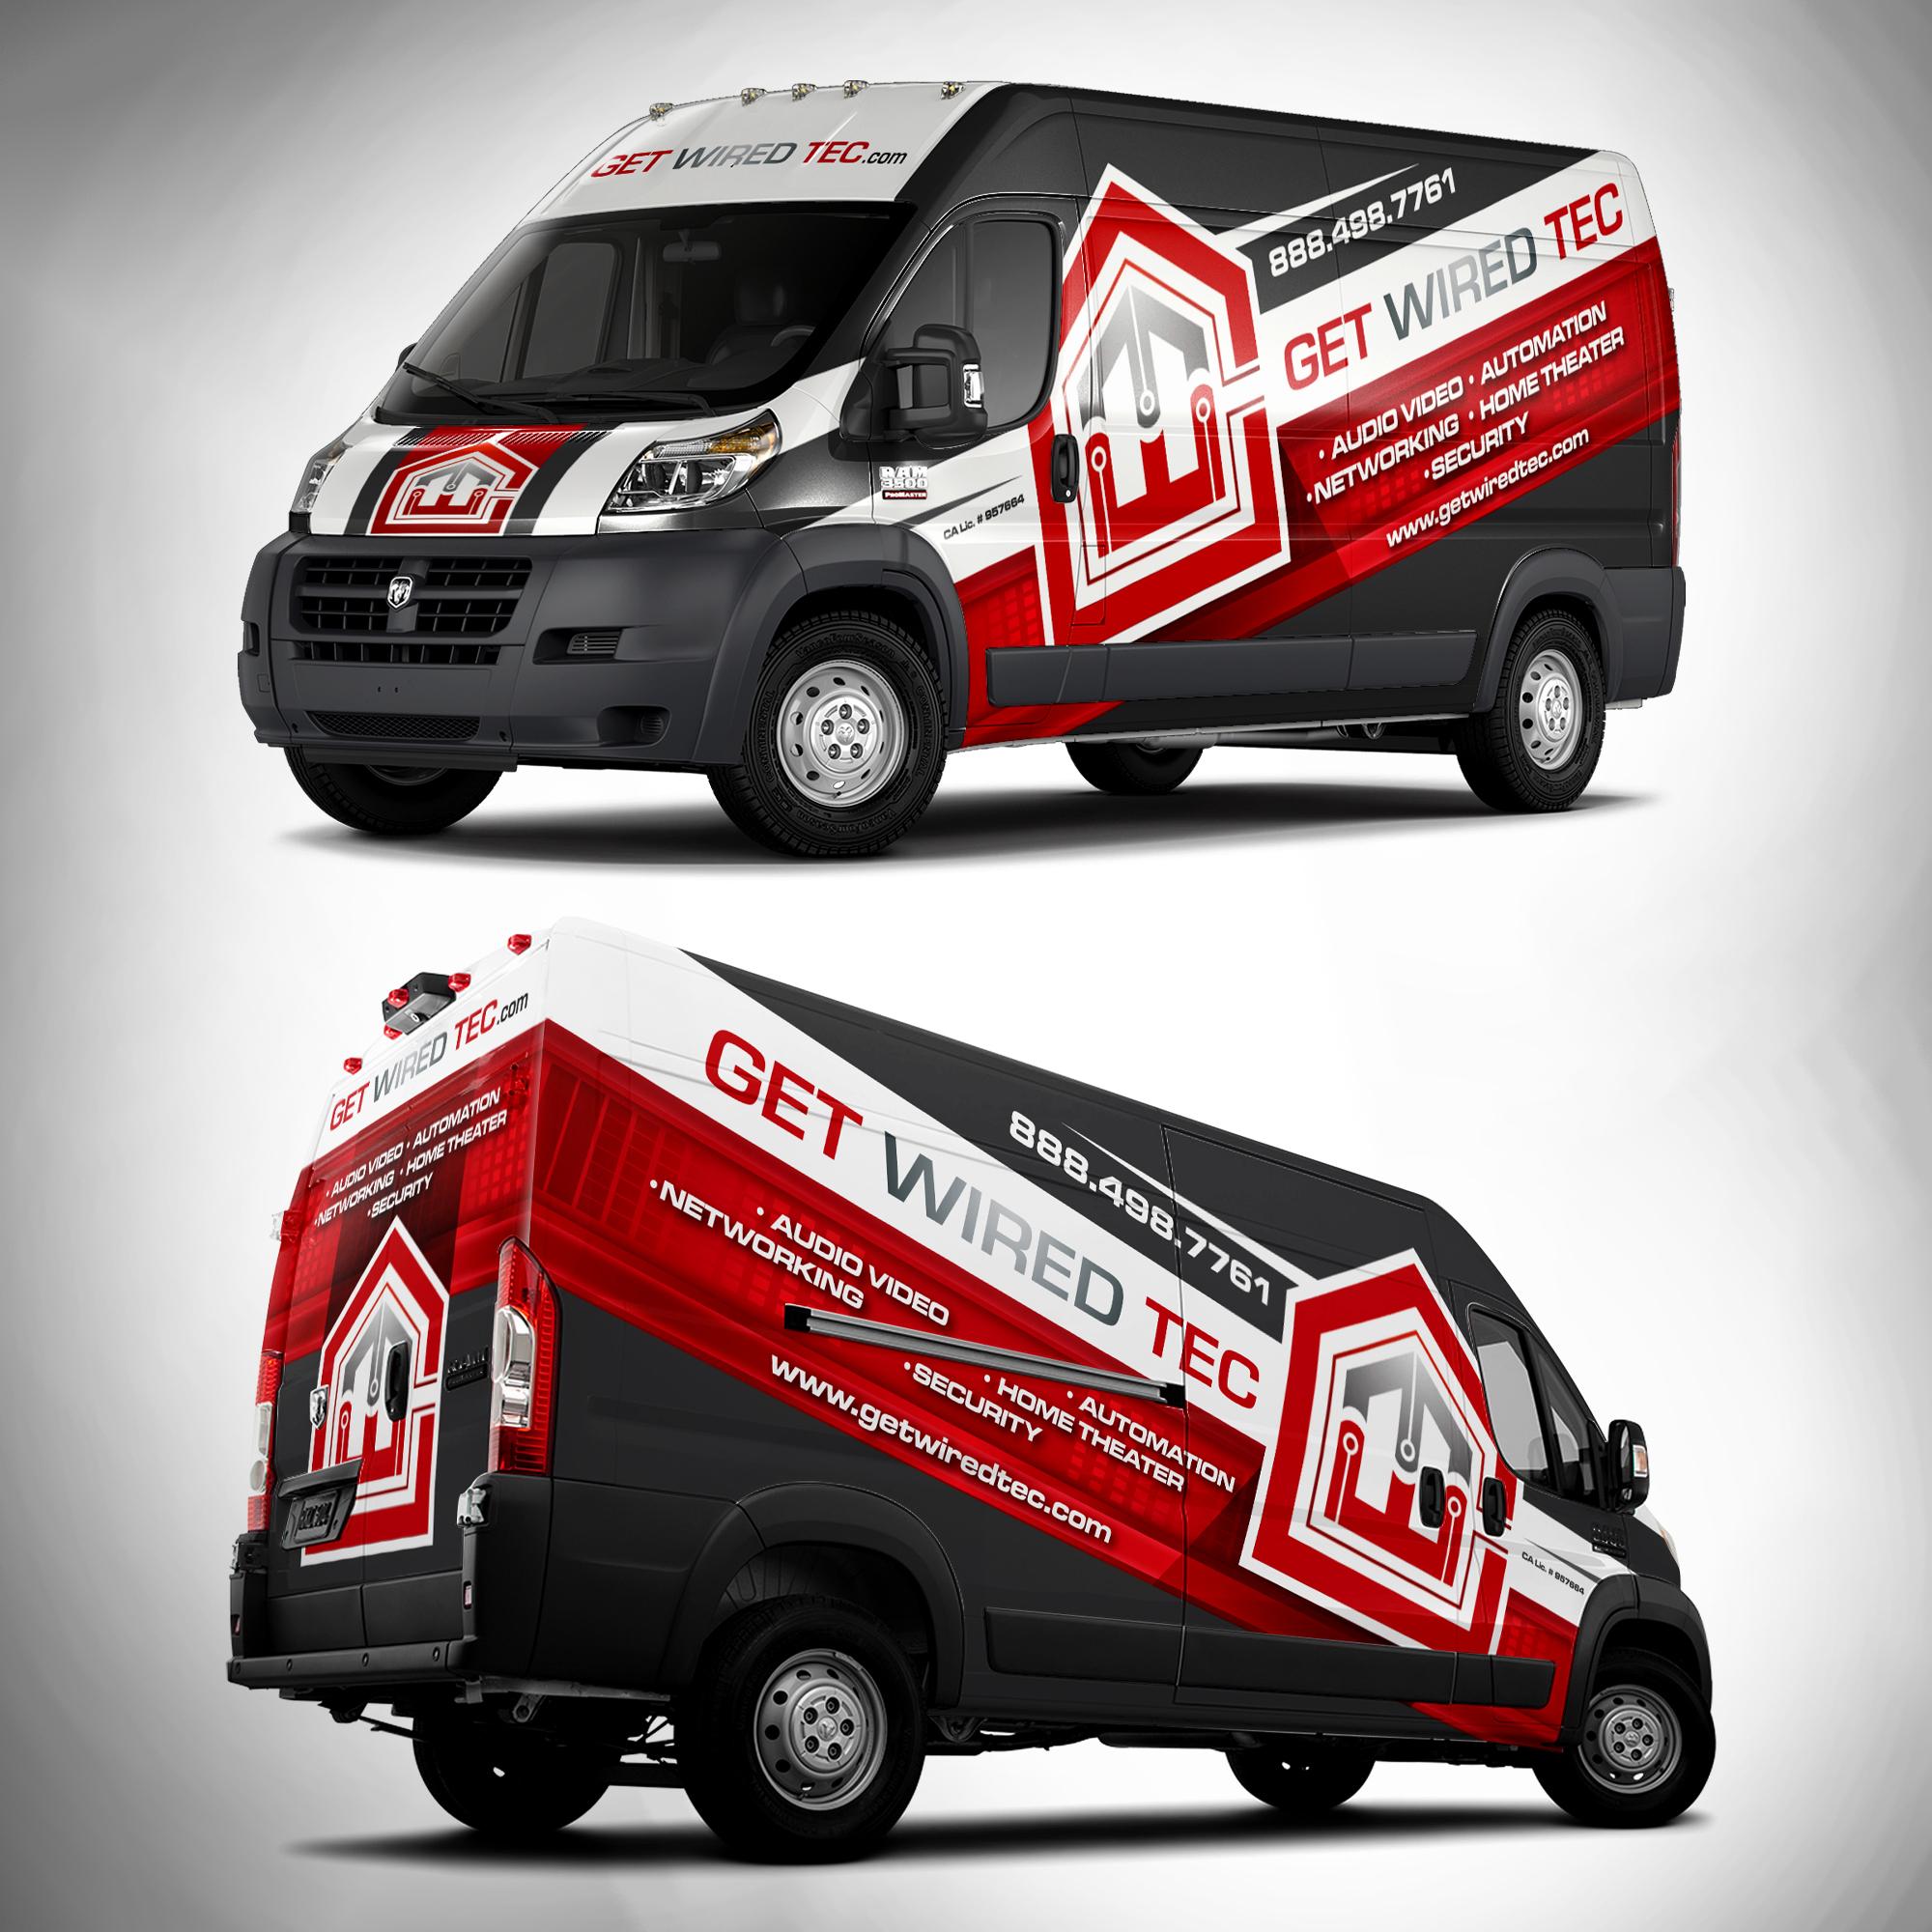 GWT RAM Promaster Wrap Zzz Wrap Van Wrap Van Design